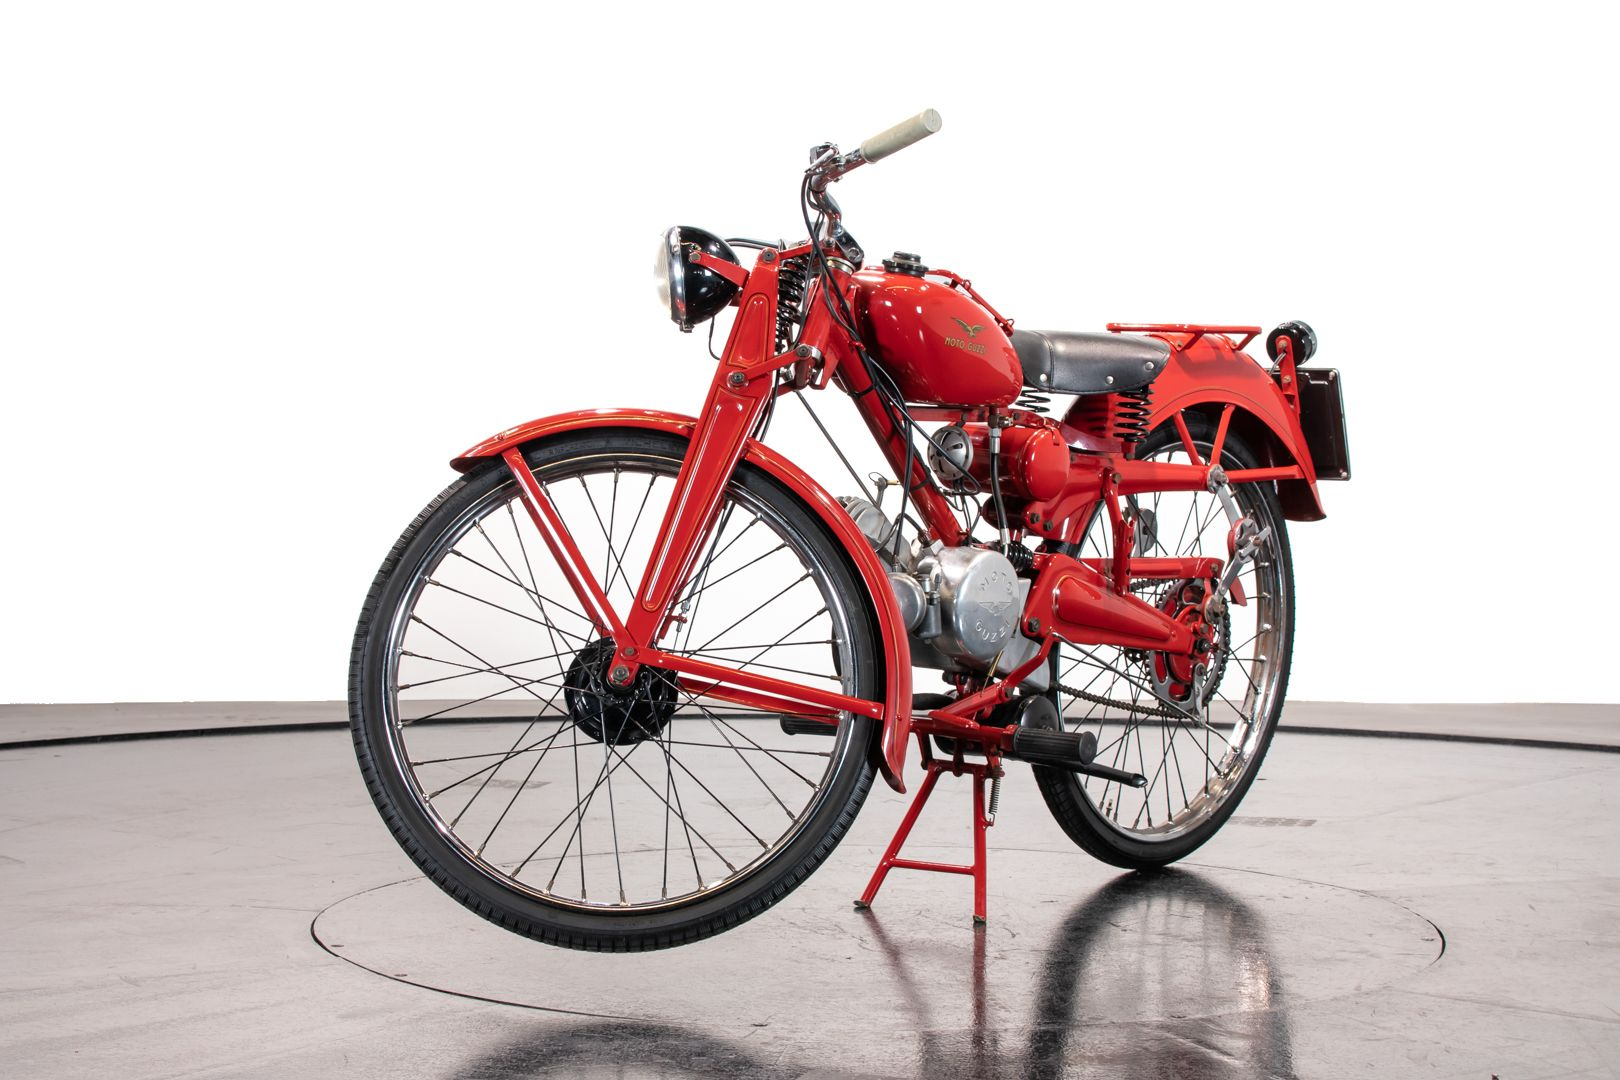 1952 Moto Guzzi 65 59387